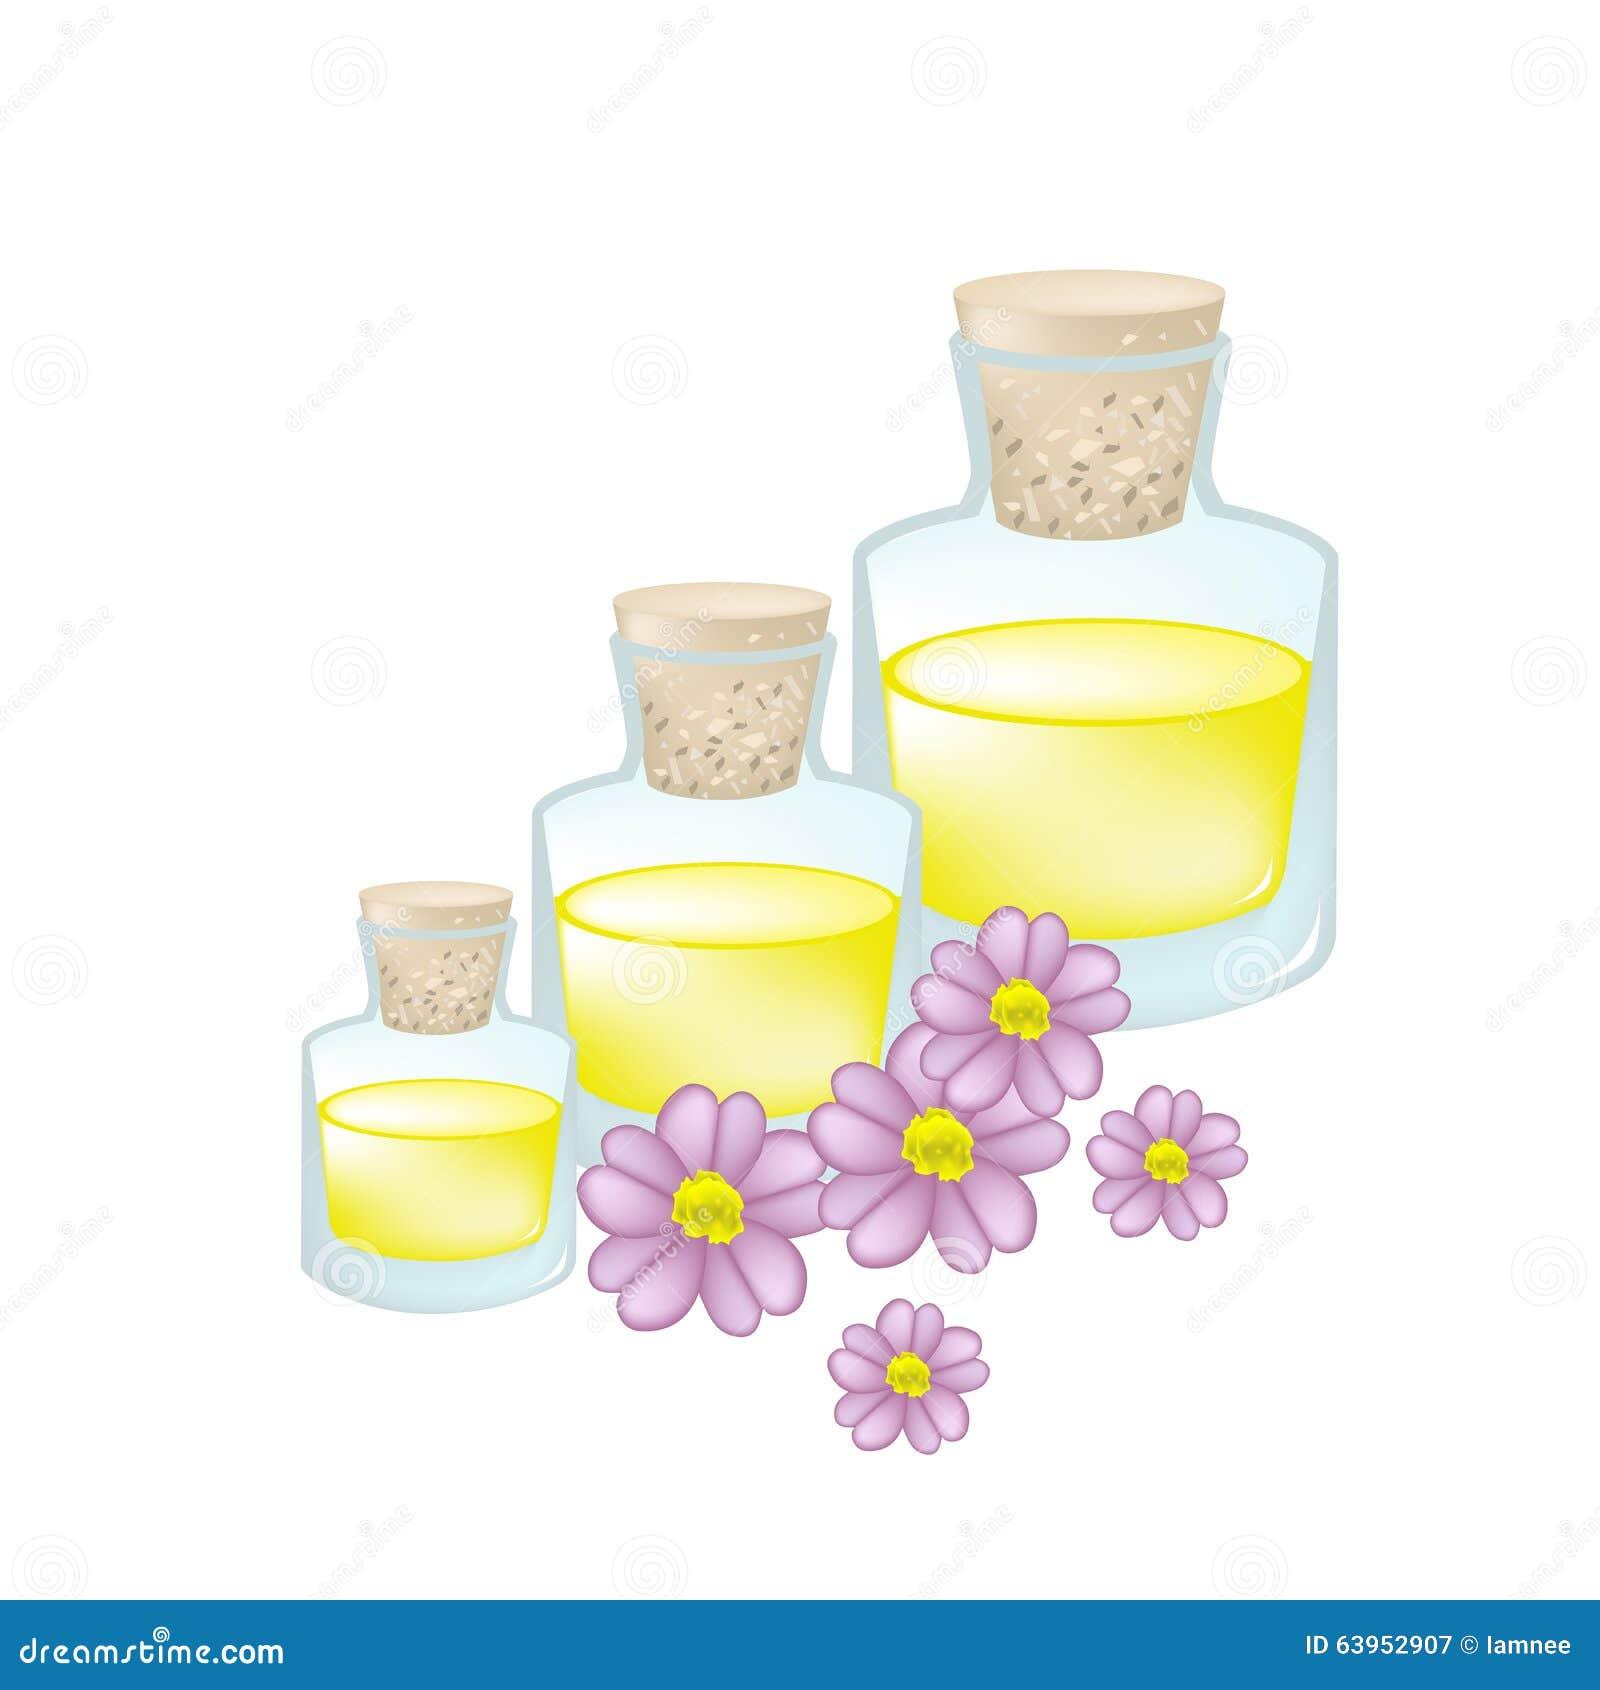 Pink Yarrow Or Achillea Millefolium With Essential Oil Stock Vector